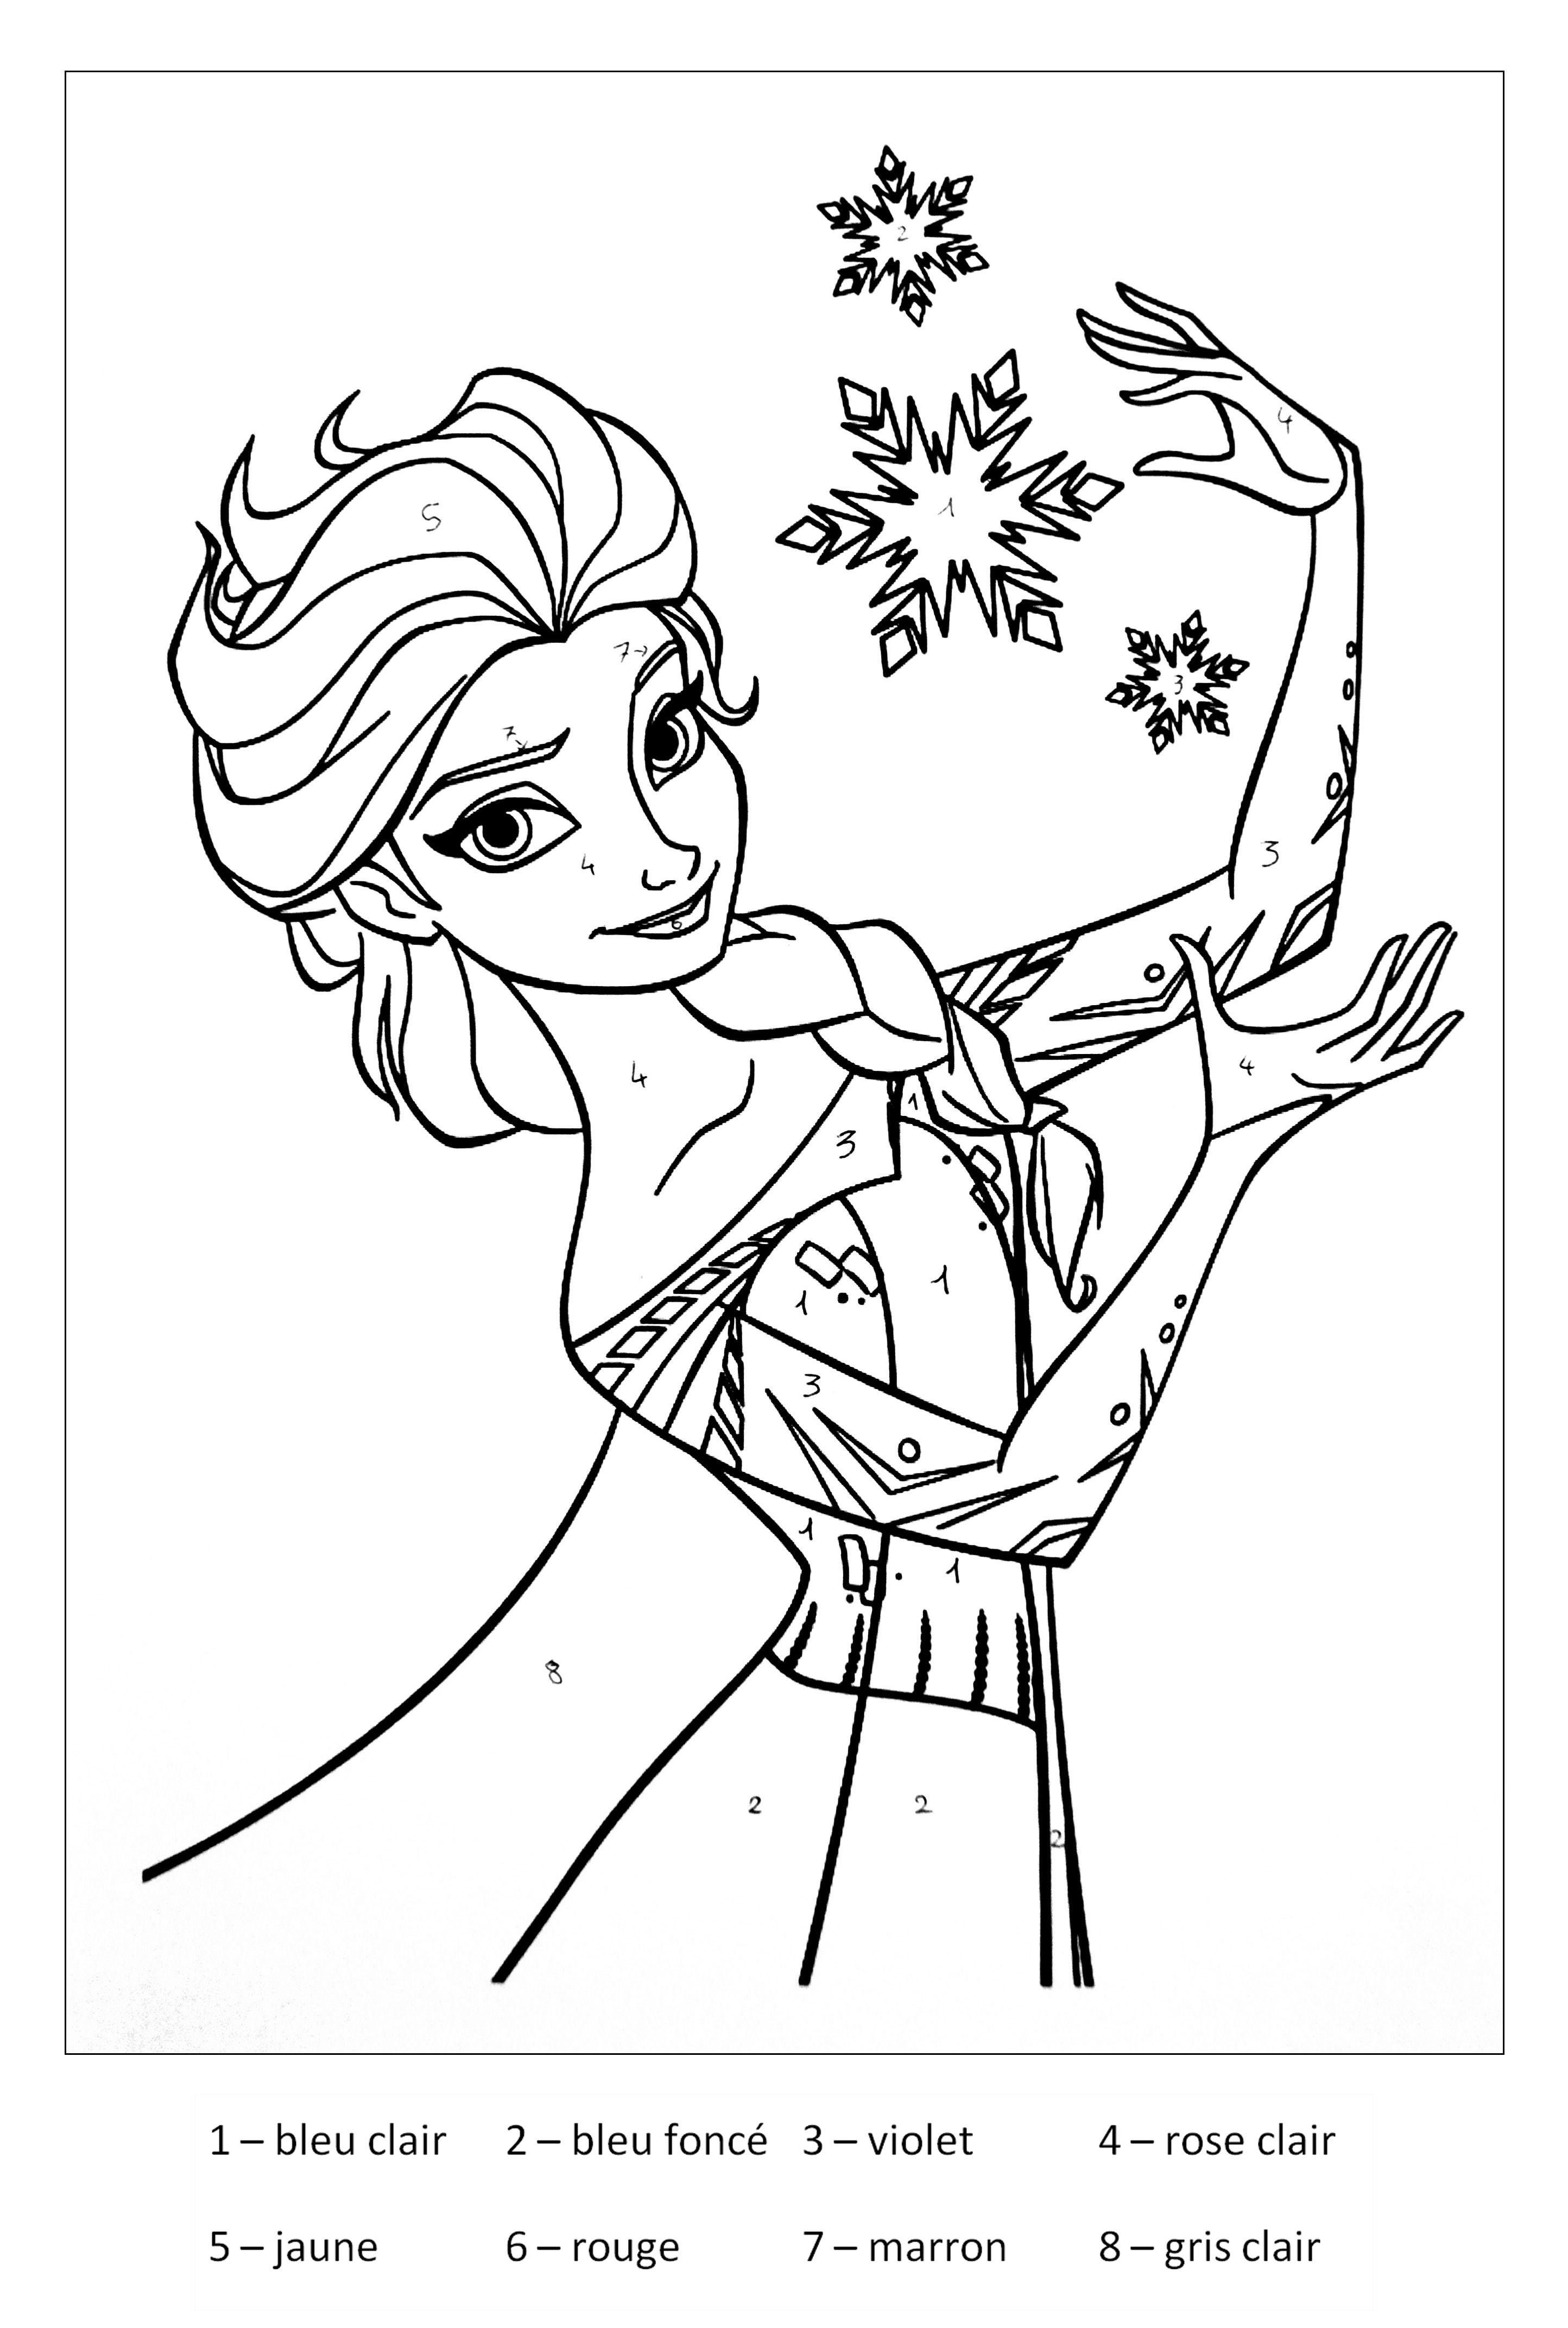 19 Frozen coloring pages ideas  coloring pages, frozen coloring